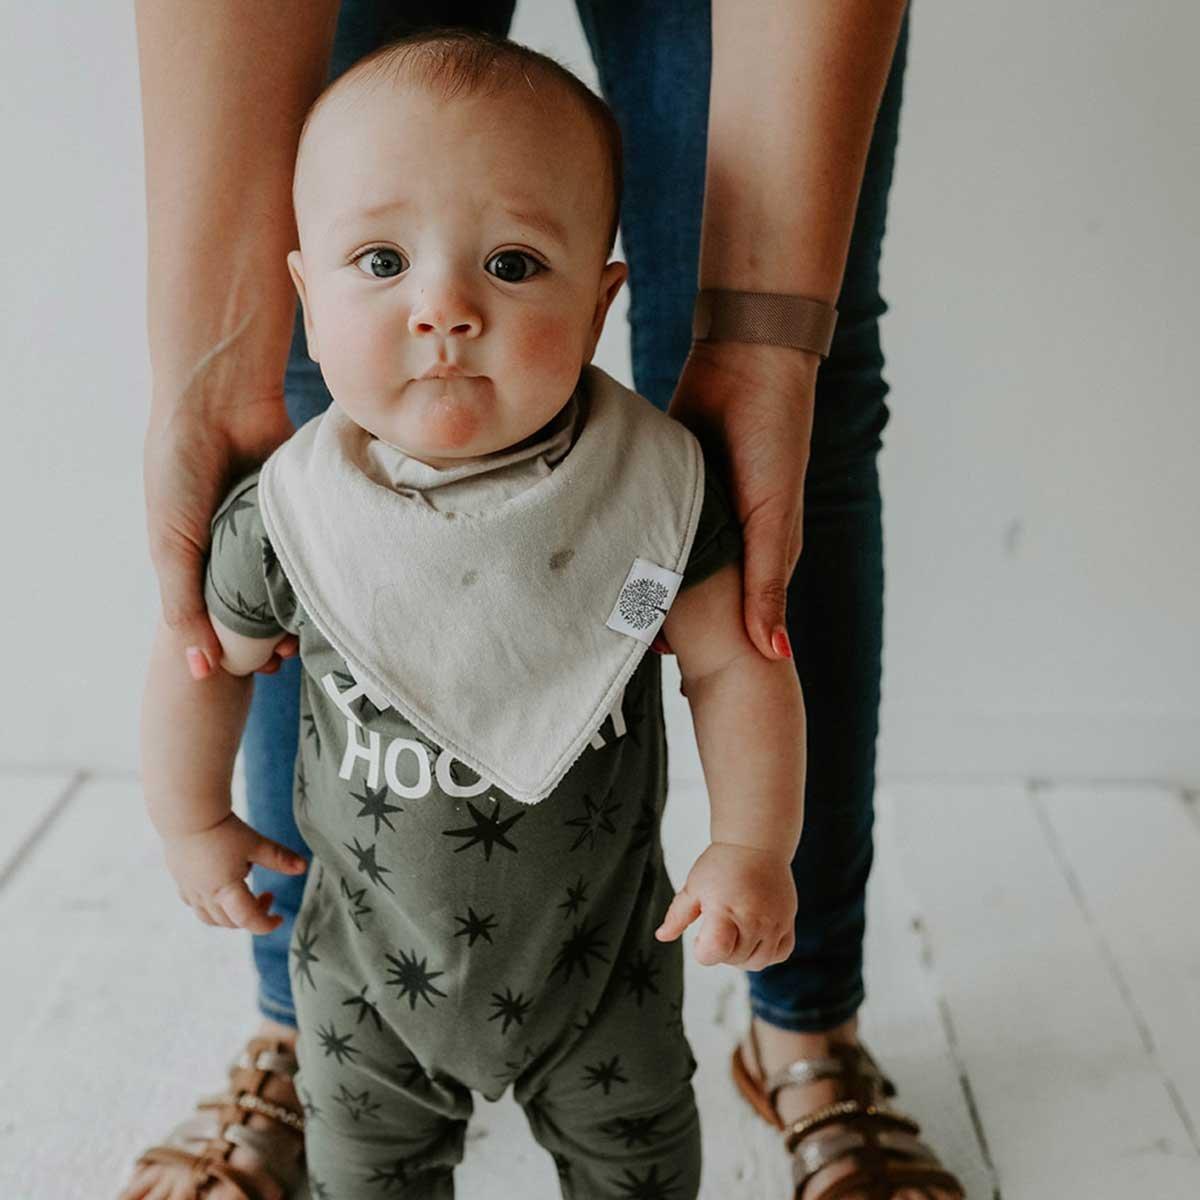 Unisex -Lunar Set Parker Baby Bandana Drool Bibs 8 Pack Baby Bibs for Boys Girls